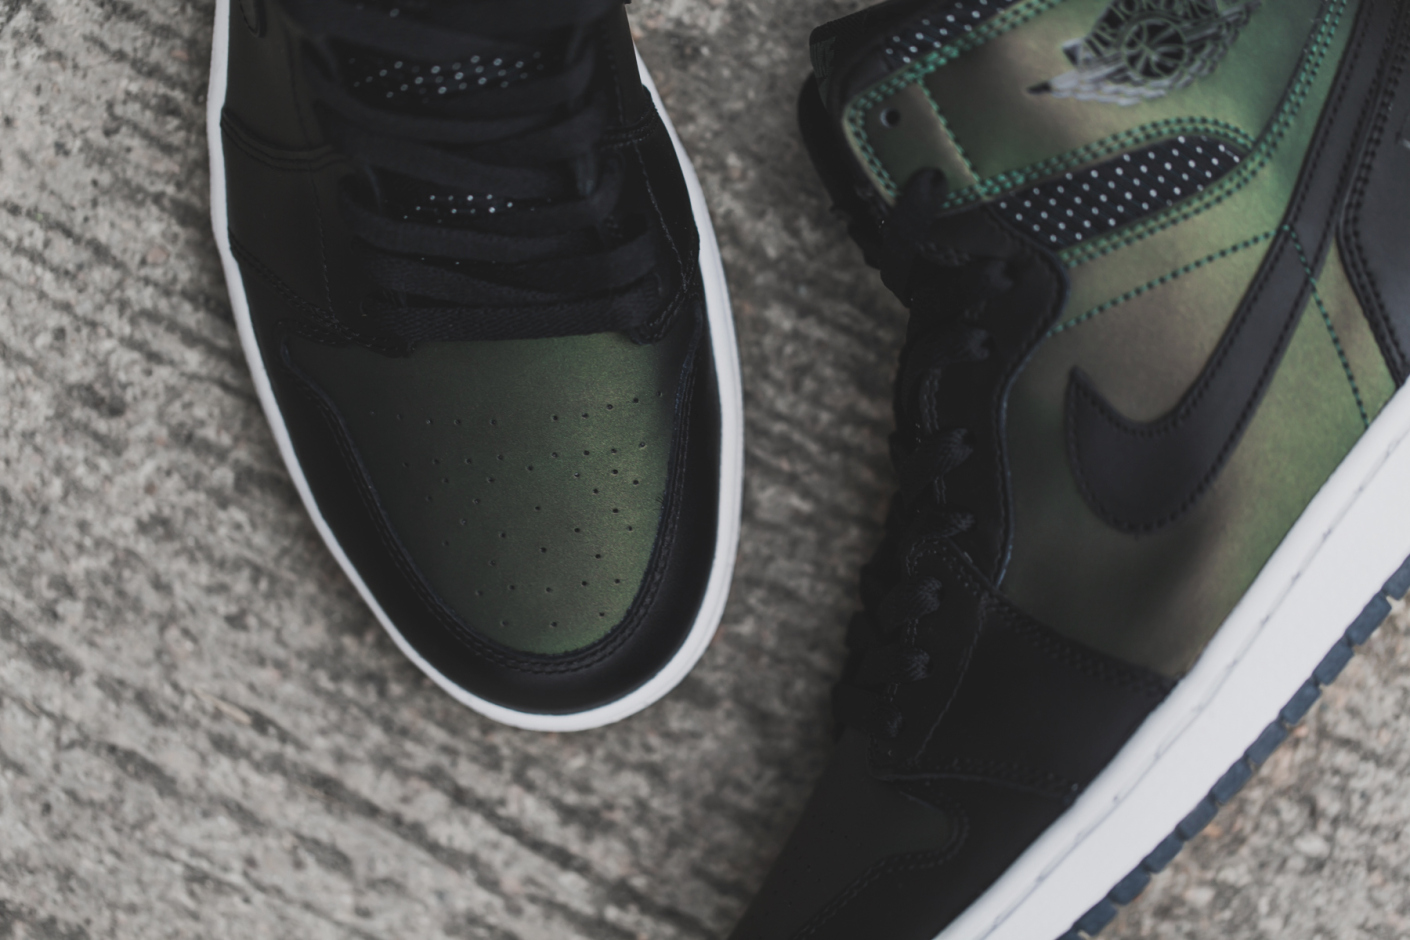 Nike SB x Air Jordan 1 by Craig Stecyk 2